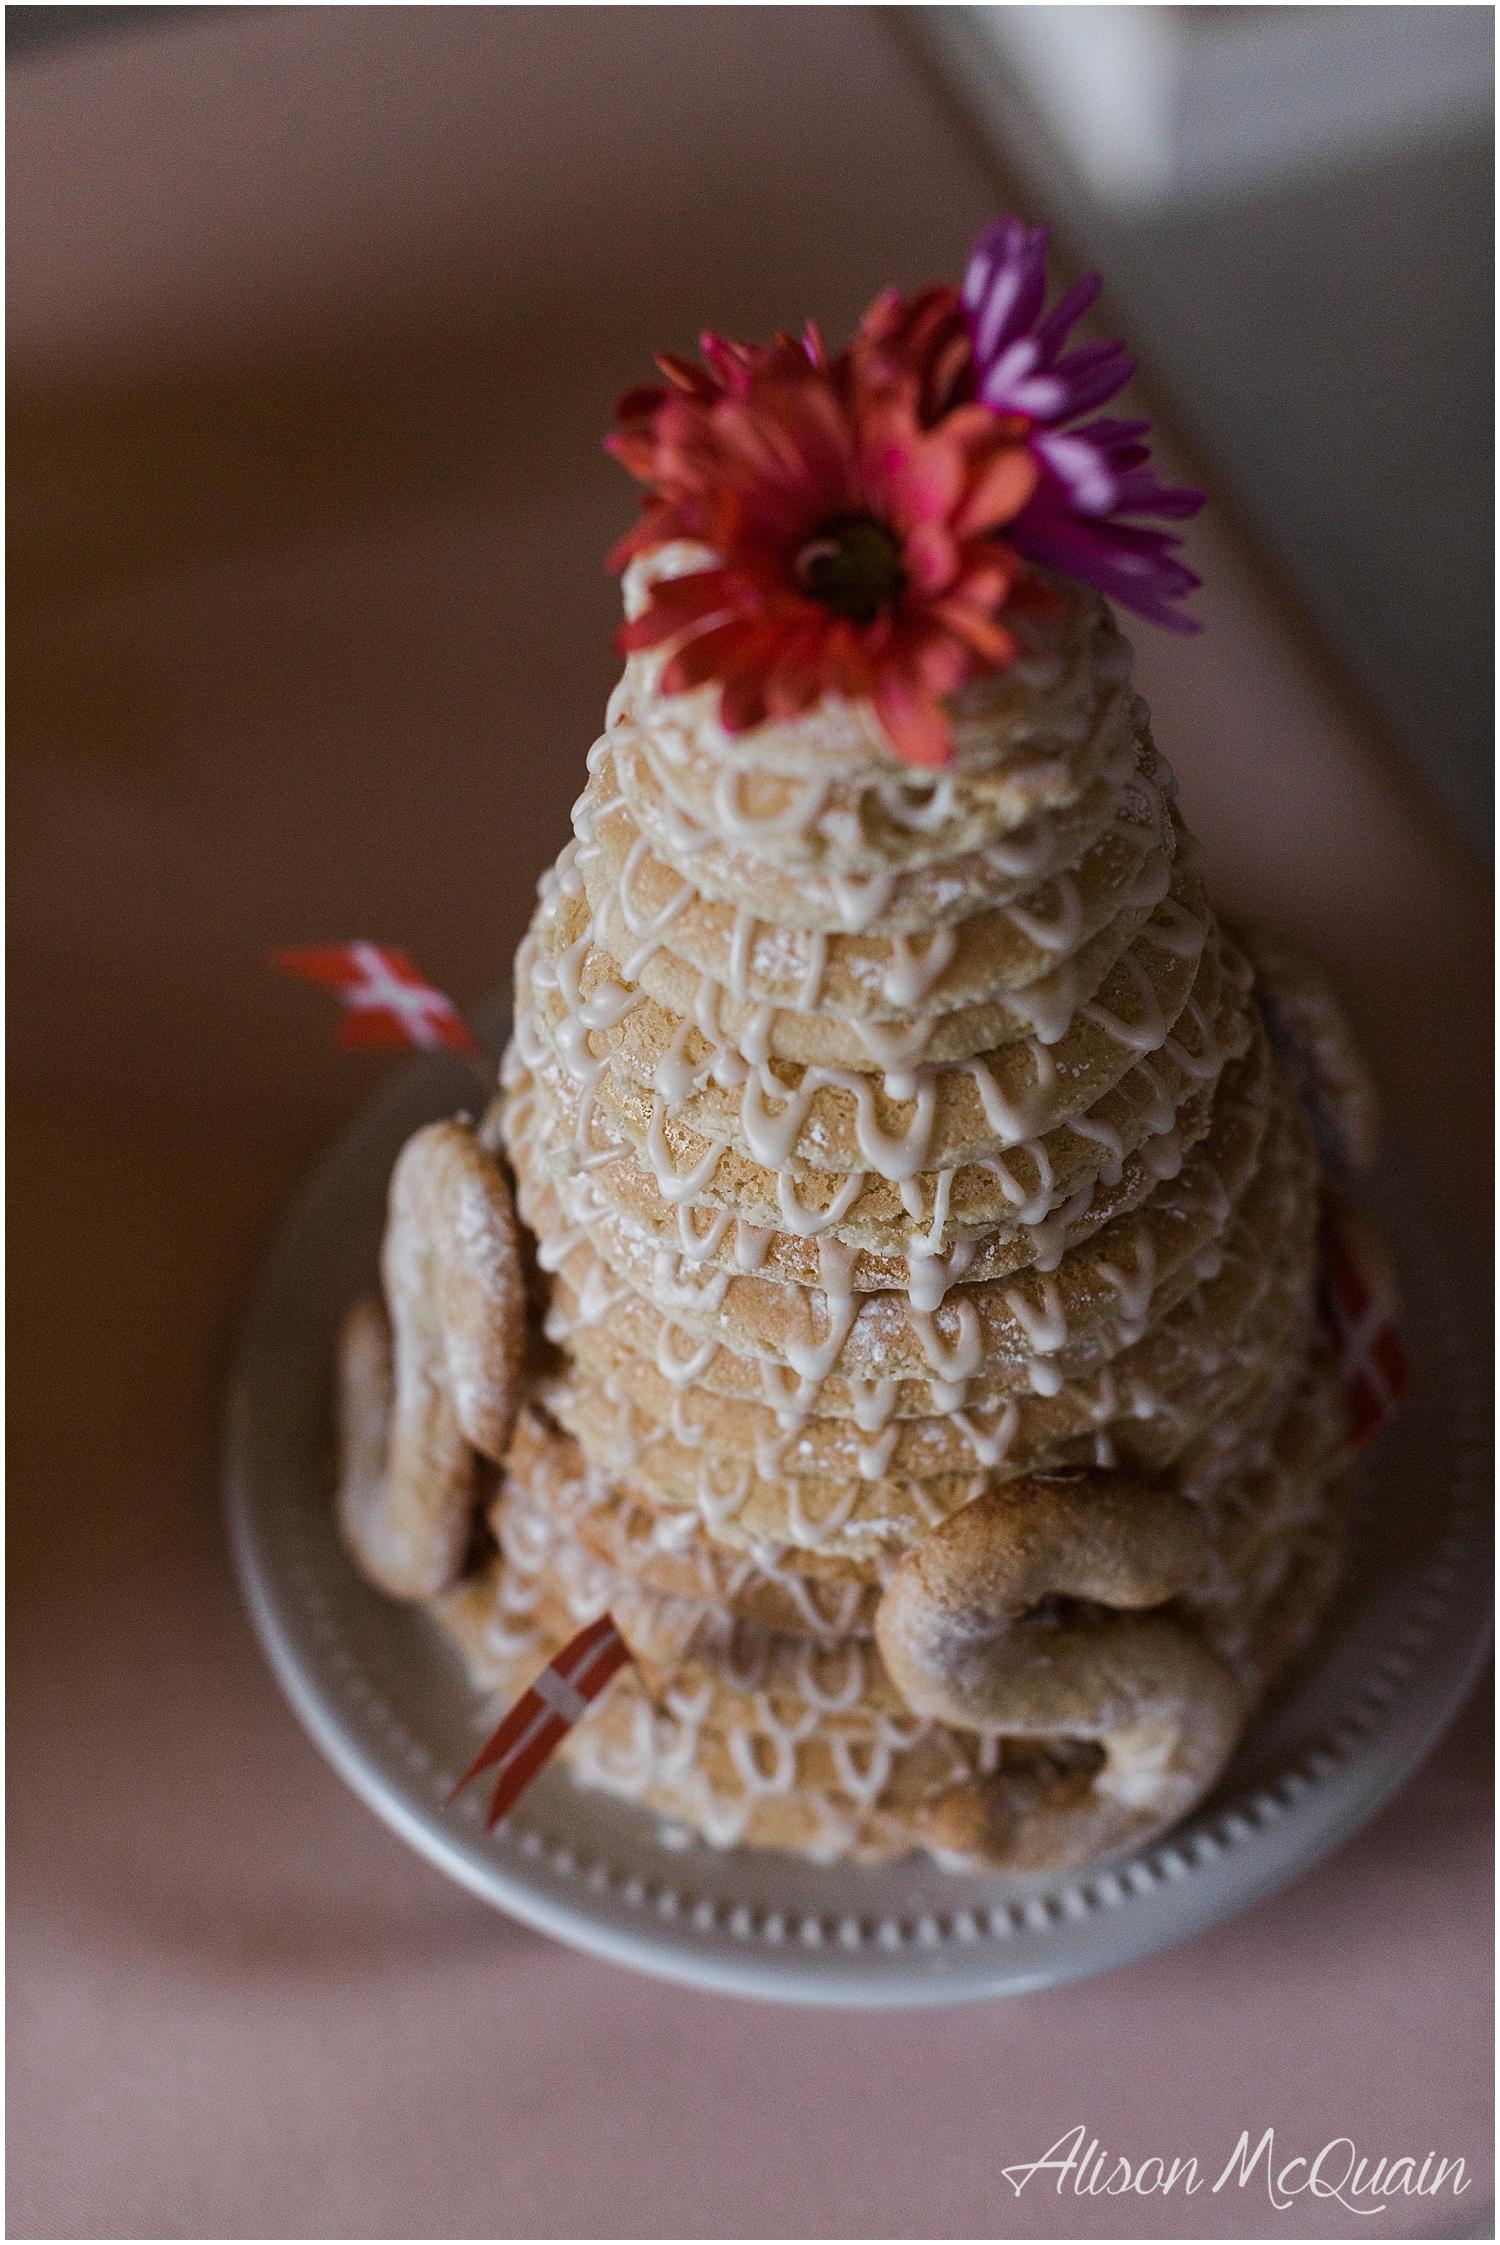 Second wedding cake because Grandma said so. A homemade Danish wedding cake. It was so yum!